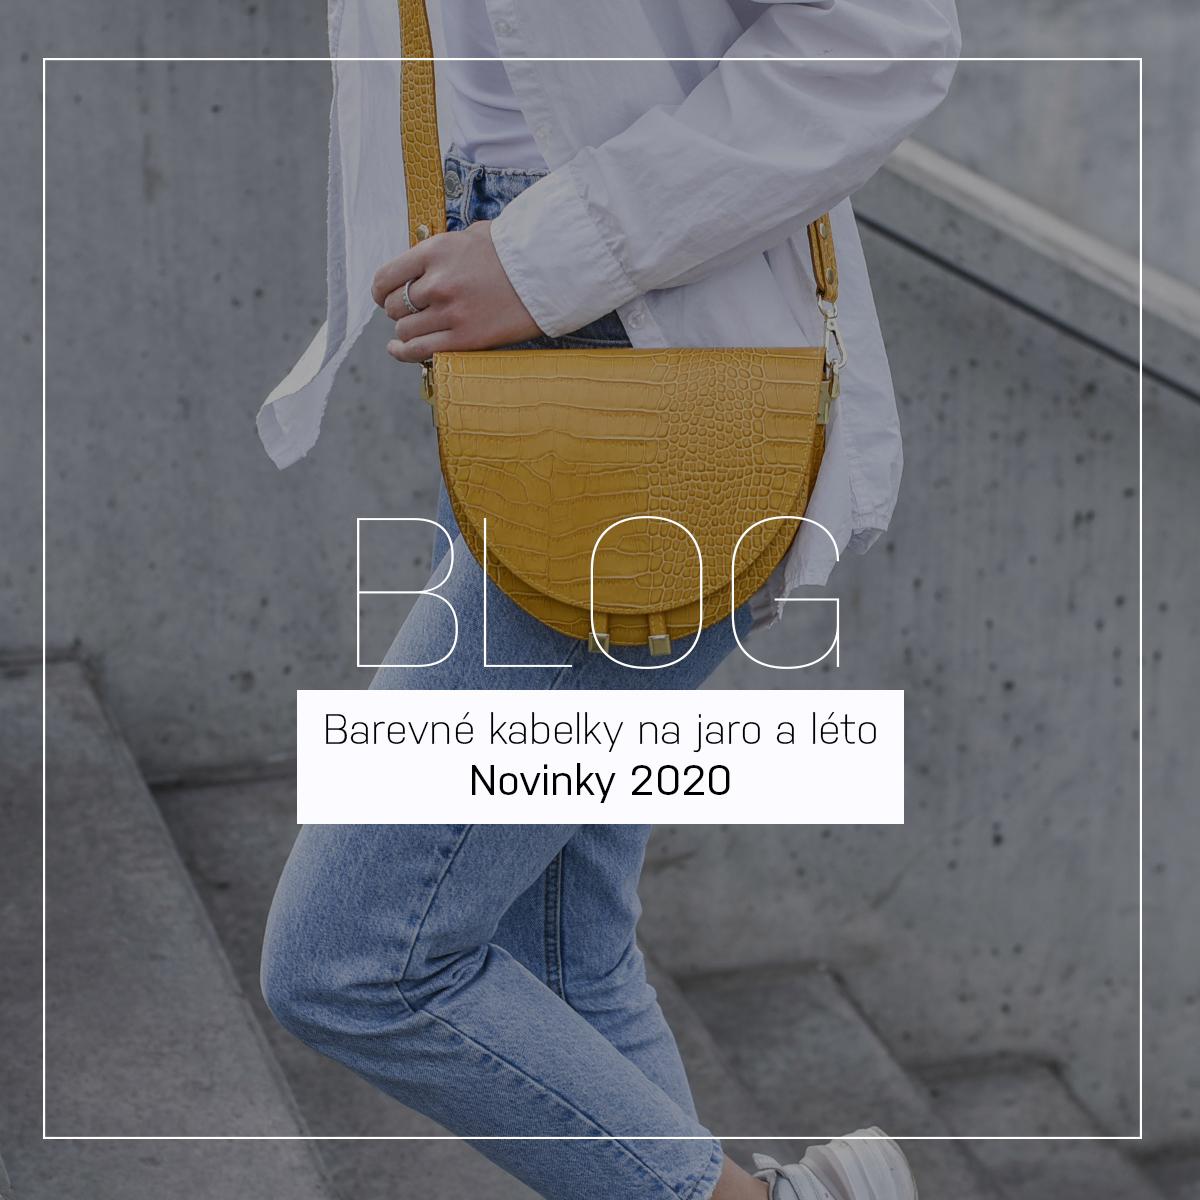 Barevné kabelky na jaro a léto | Novinky 2020